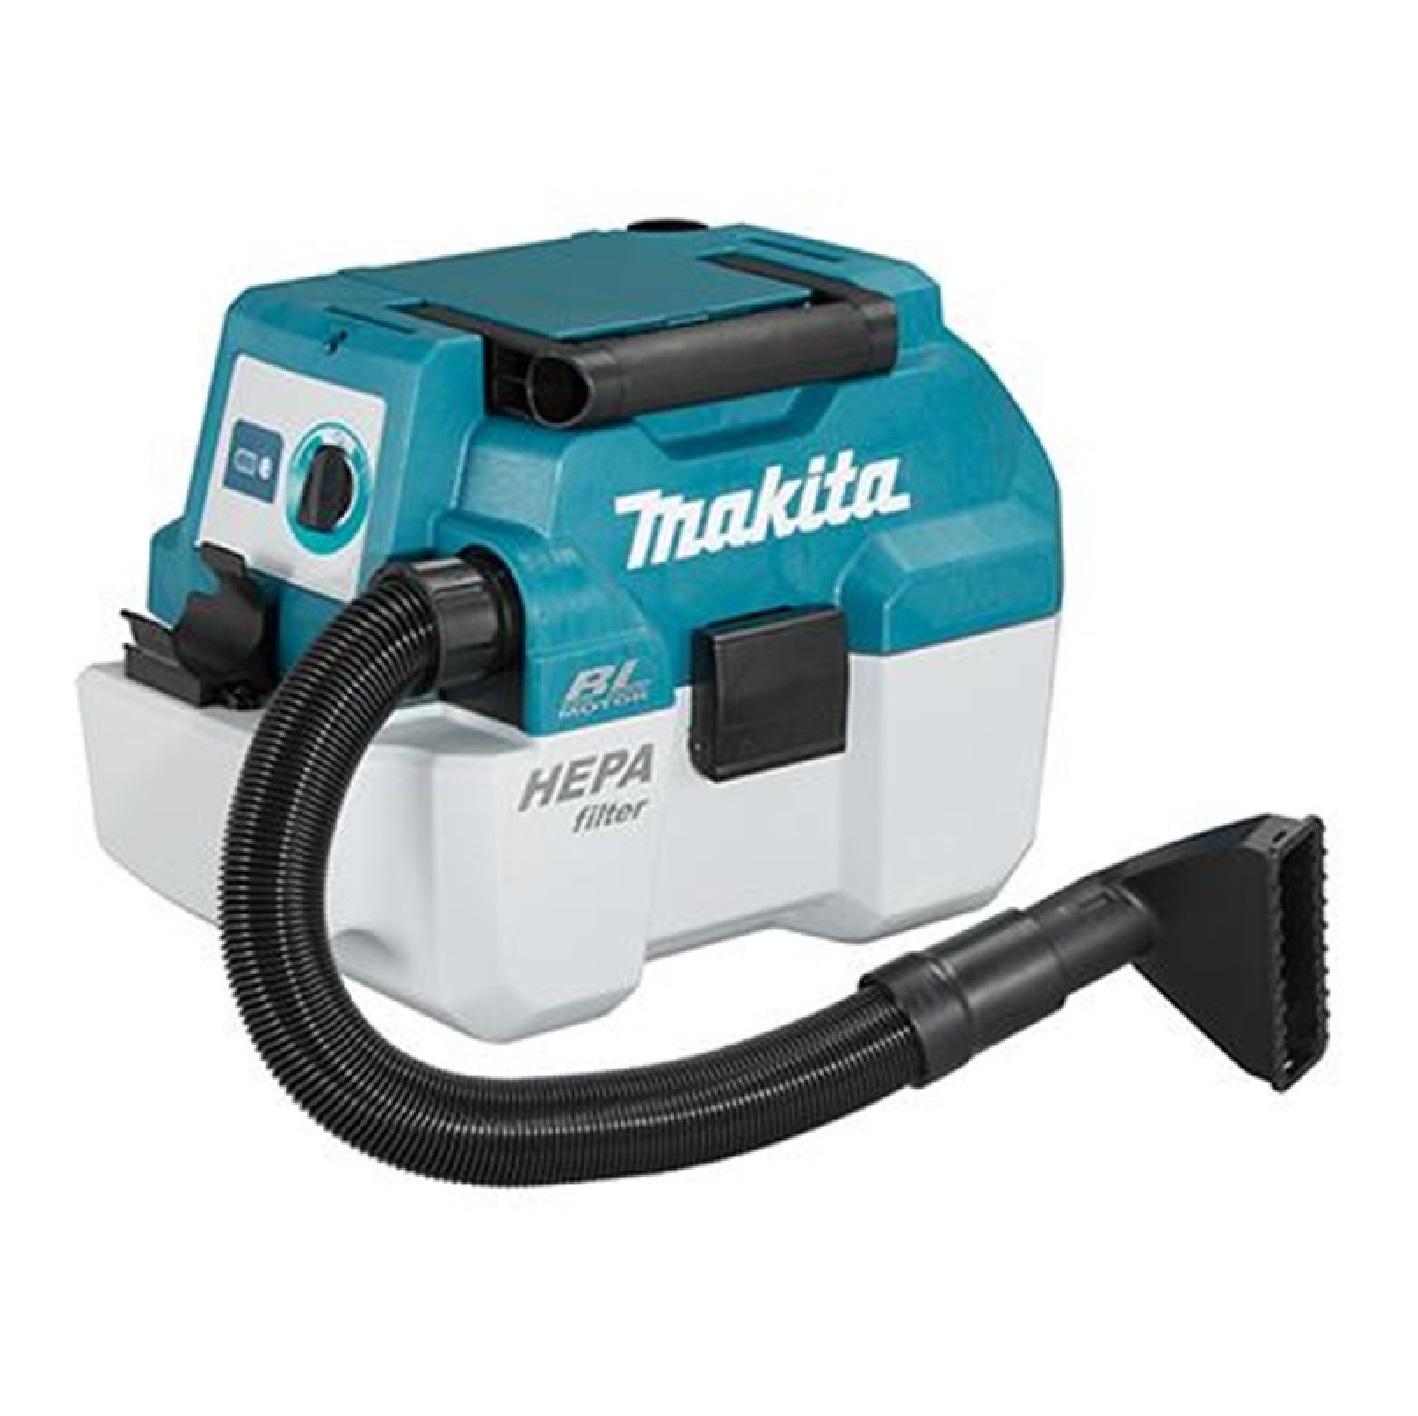 Makita DVC750LZX1 18V LI-ION Vacuum Cleaner - Bare Unit